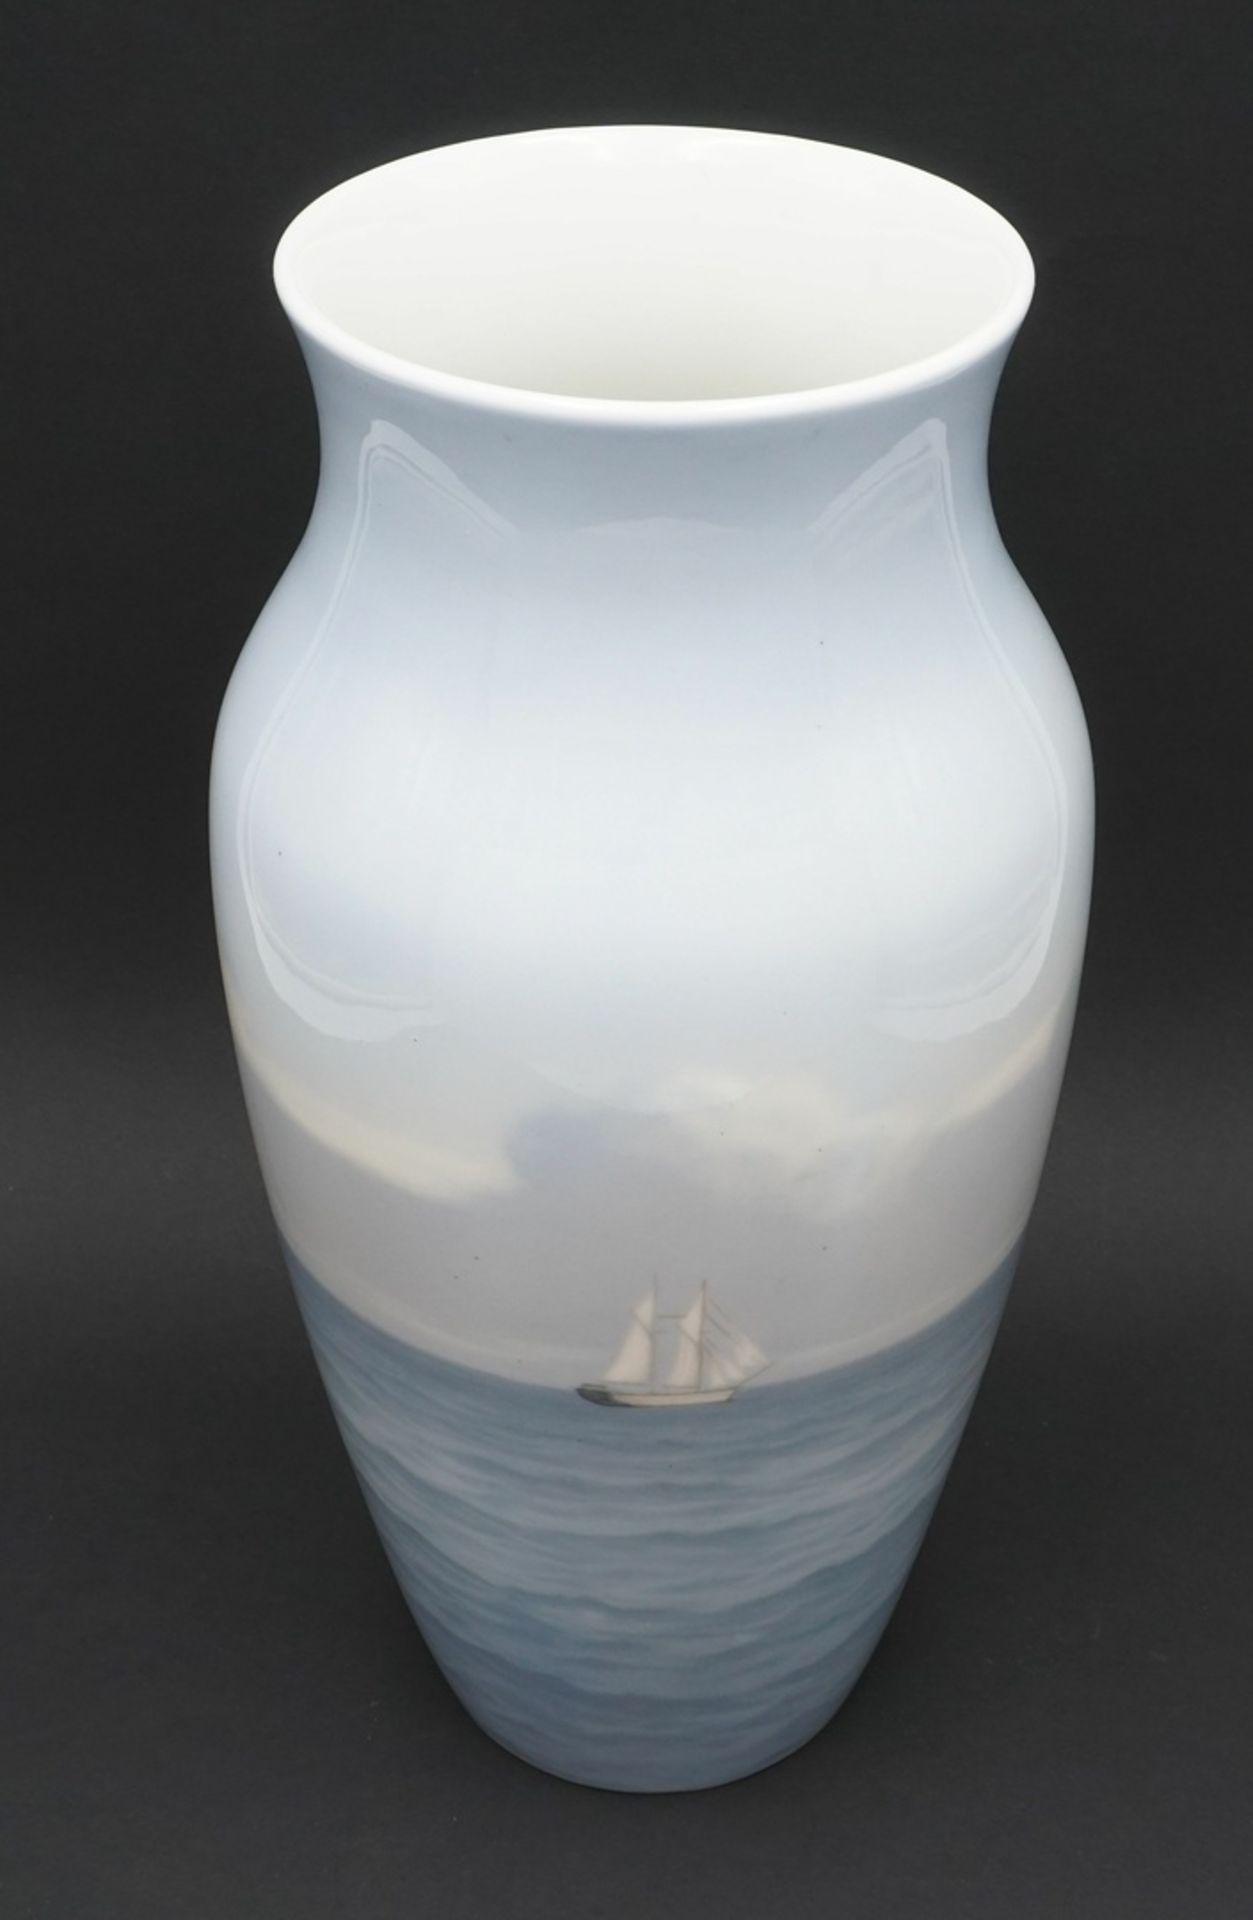 Royal Copenhagen Vase, 1889-1922 - Bild 2 aus 3